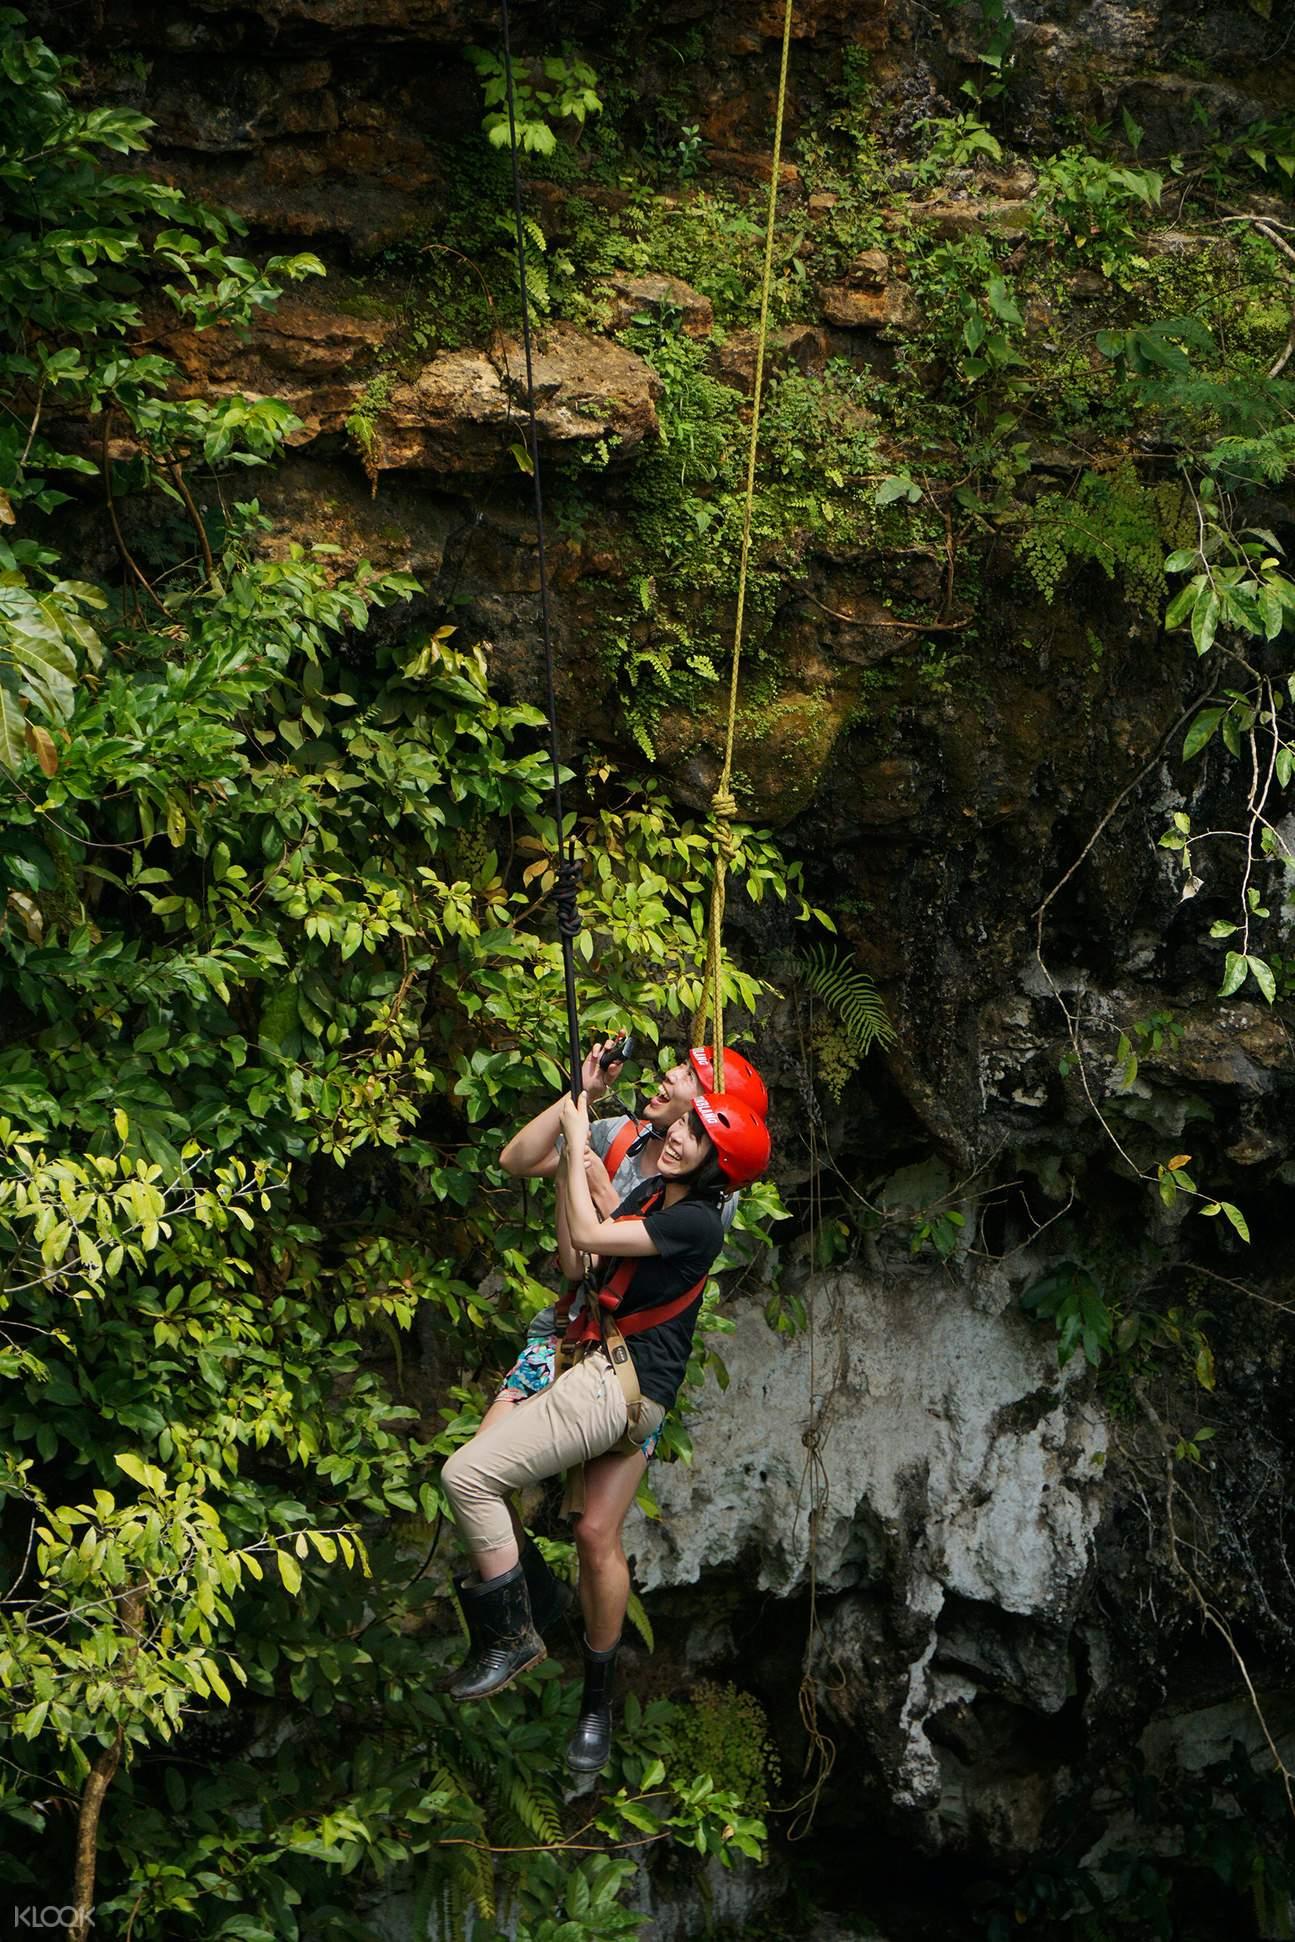 Jomblang洞穴,普蘭巴南,日惹探洞,爪哇探洞,爪哇洞穴,日惹洞穴